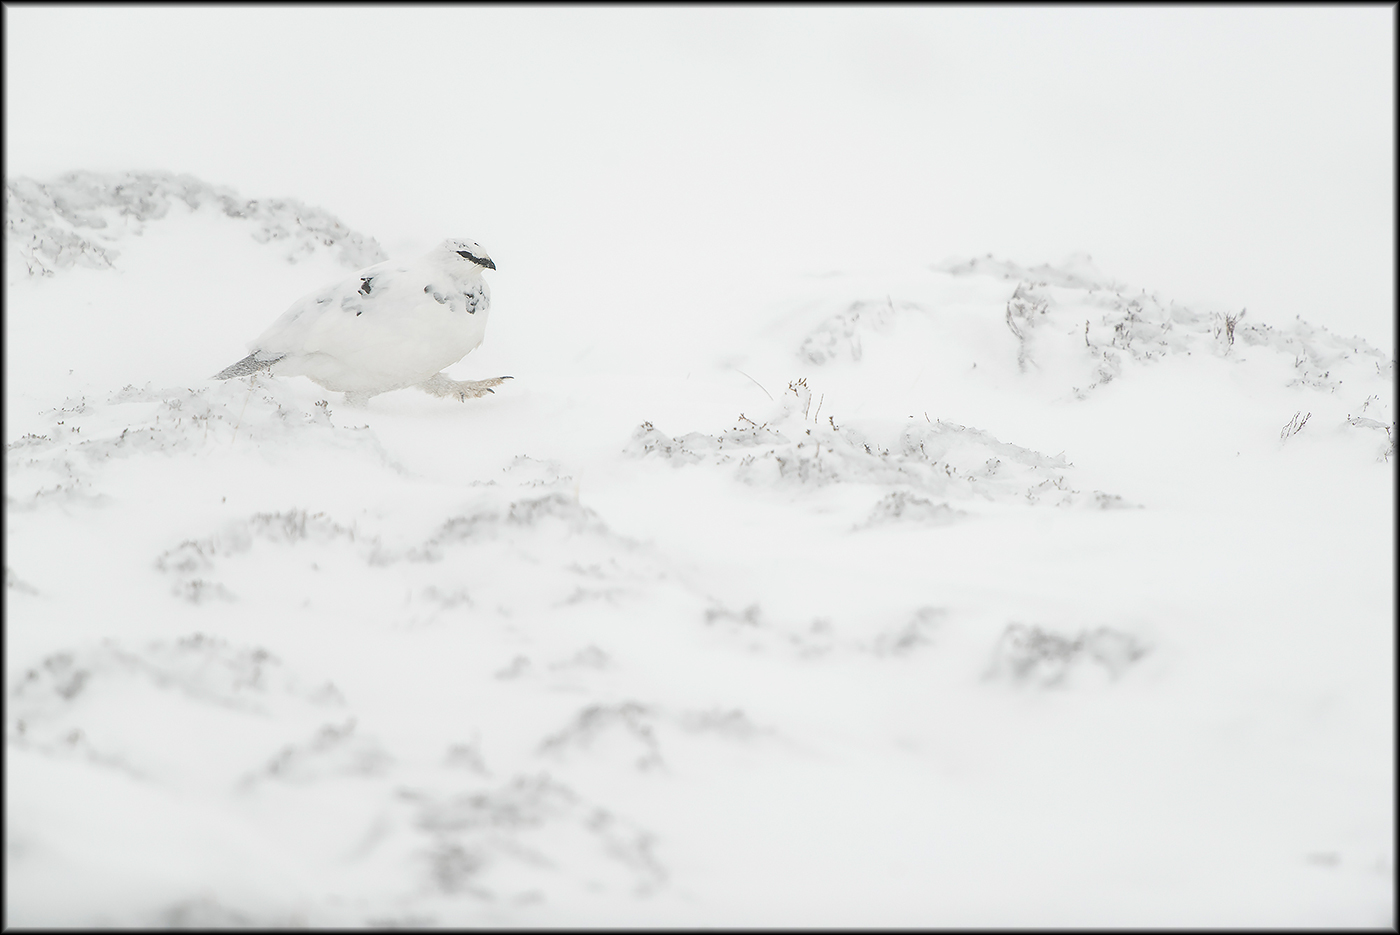 white and wild - white and wild